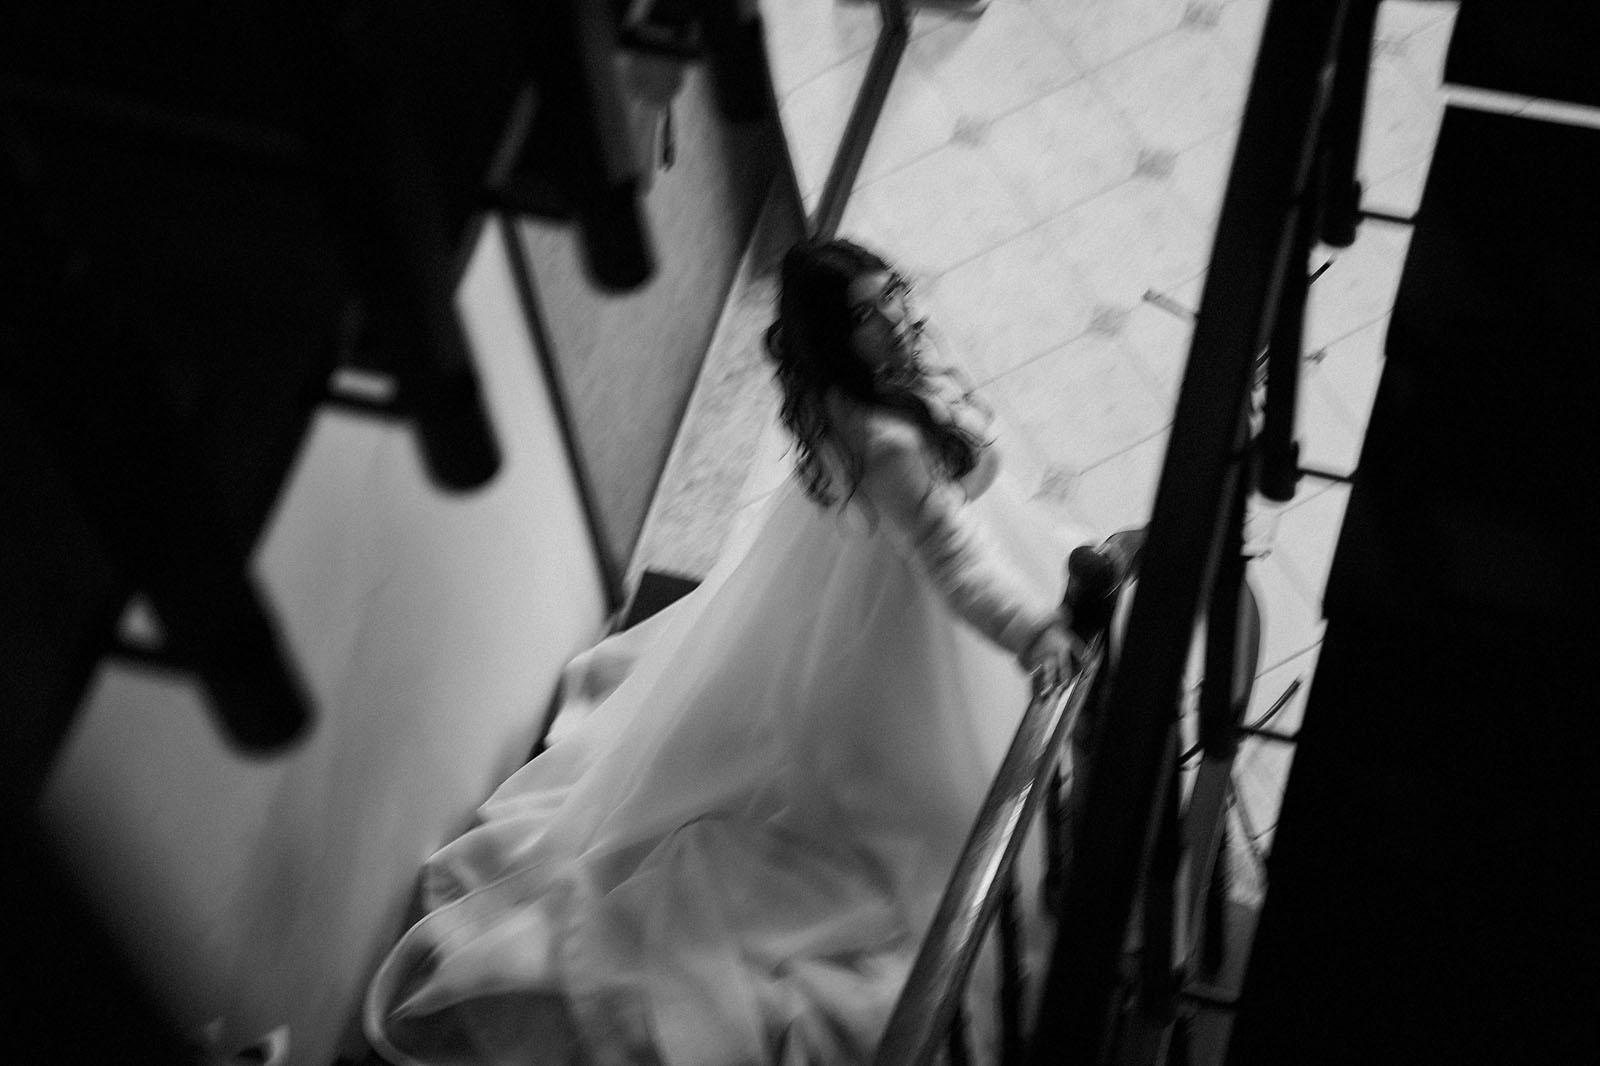 wedding@bekarev2021-04-10-12-17-36-bw.jpg